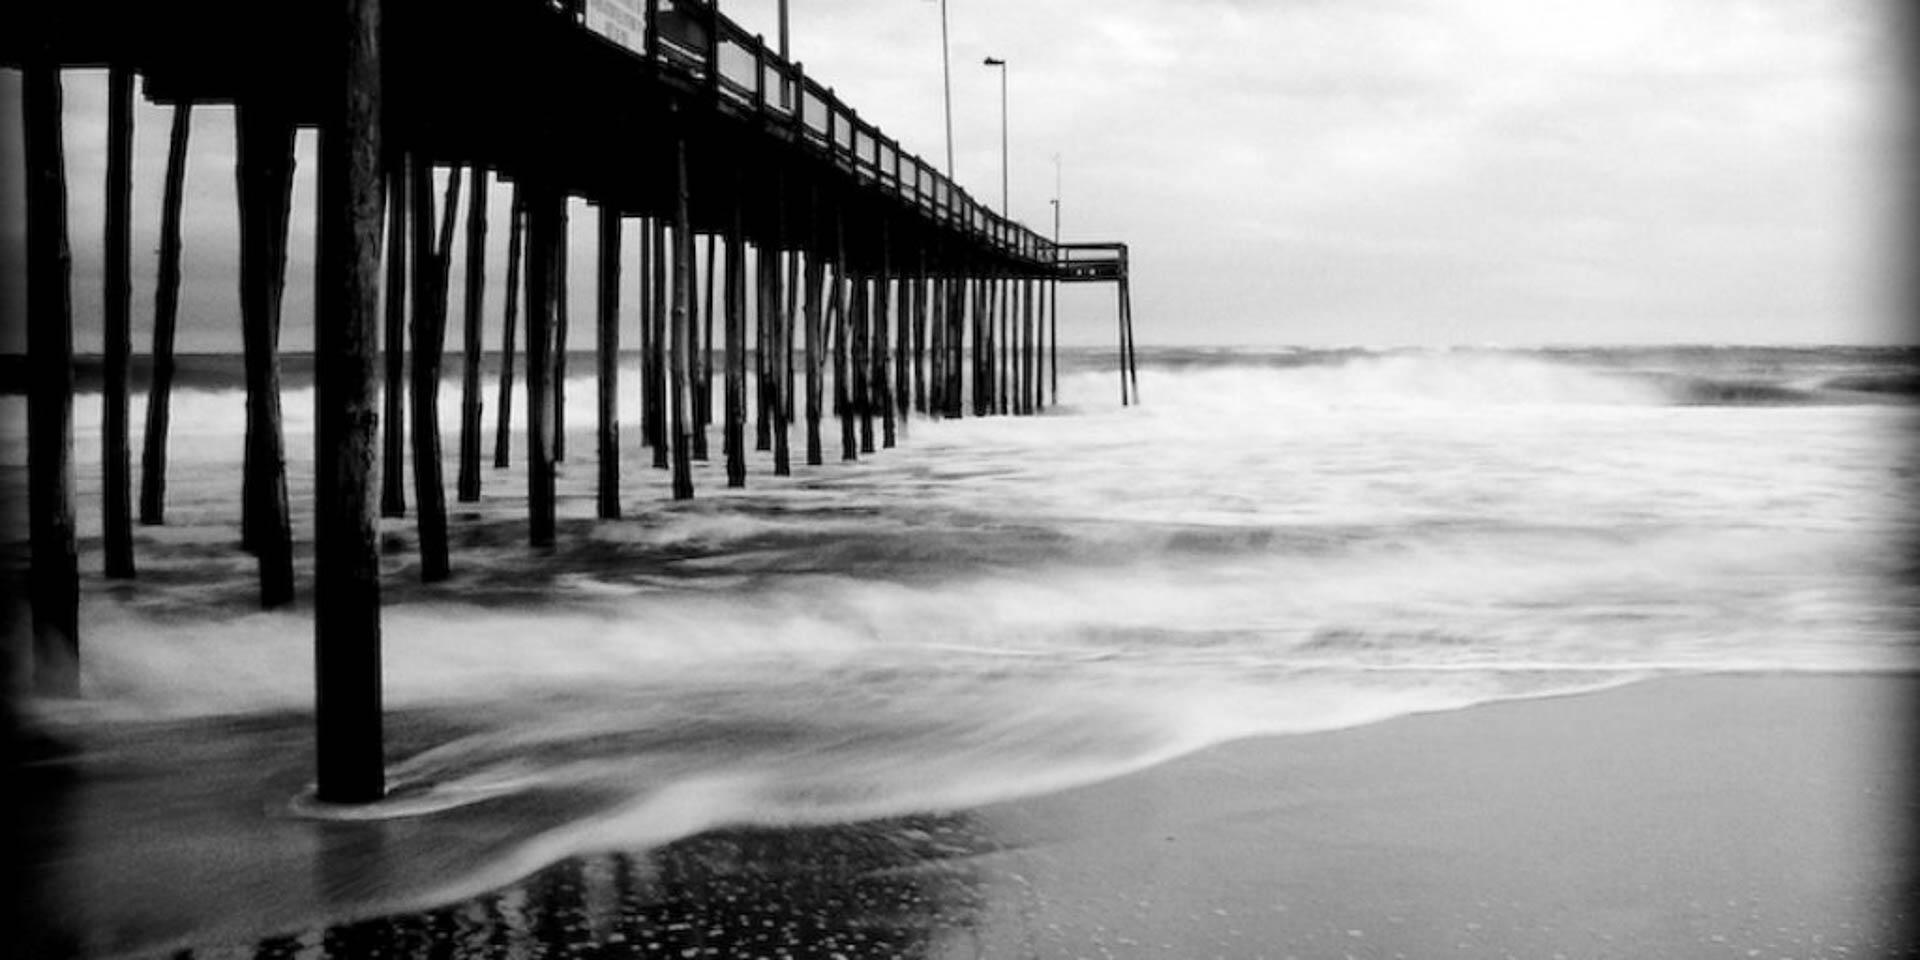 fishing-pier-and-surf-14x14-2.jpg